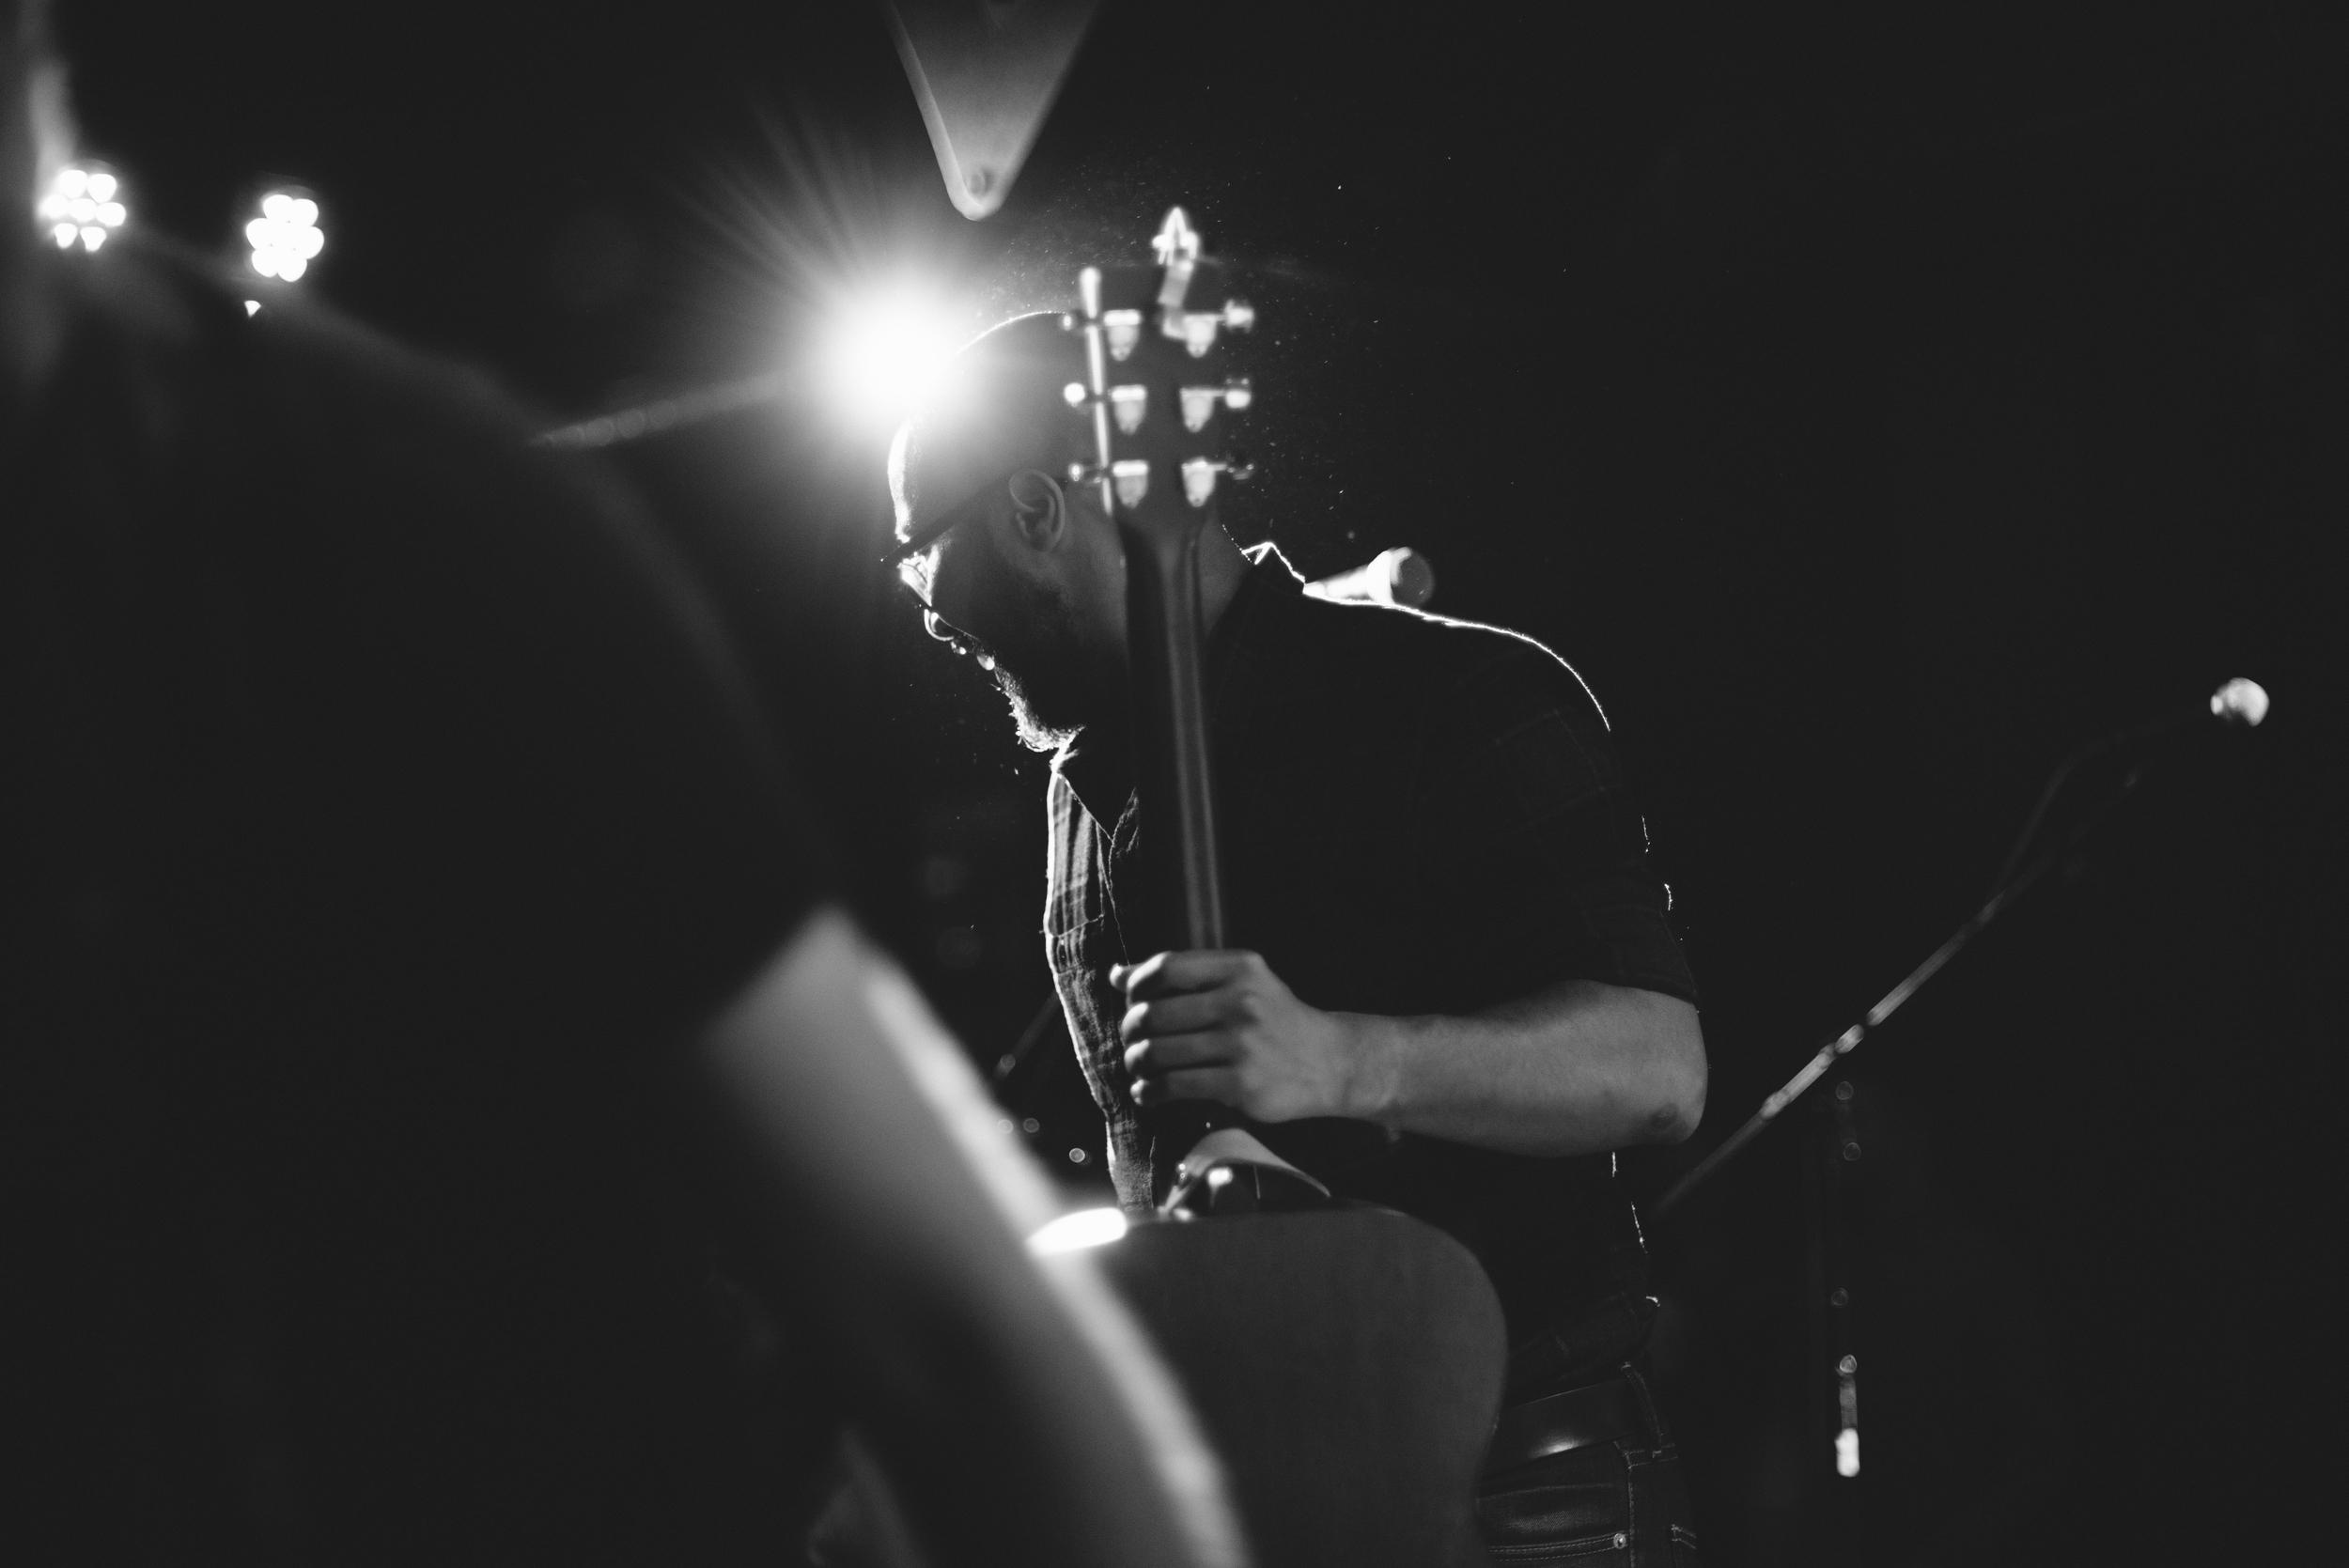 Coyote Talk & Joel Levi - High Res Flickr -215.JPG